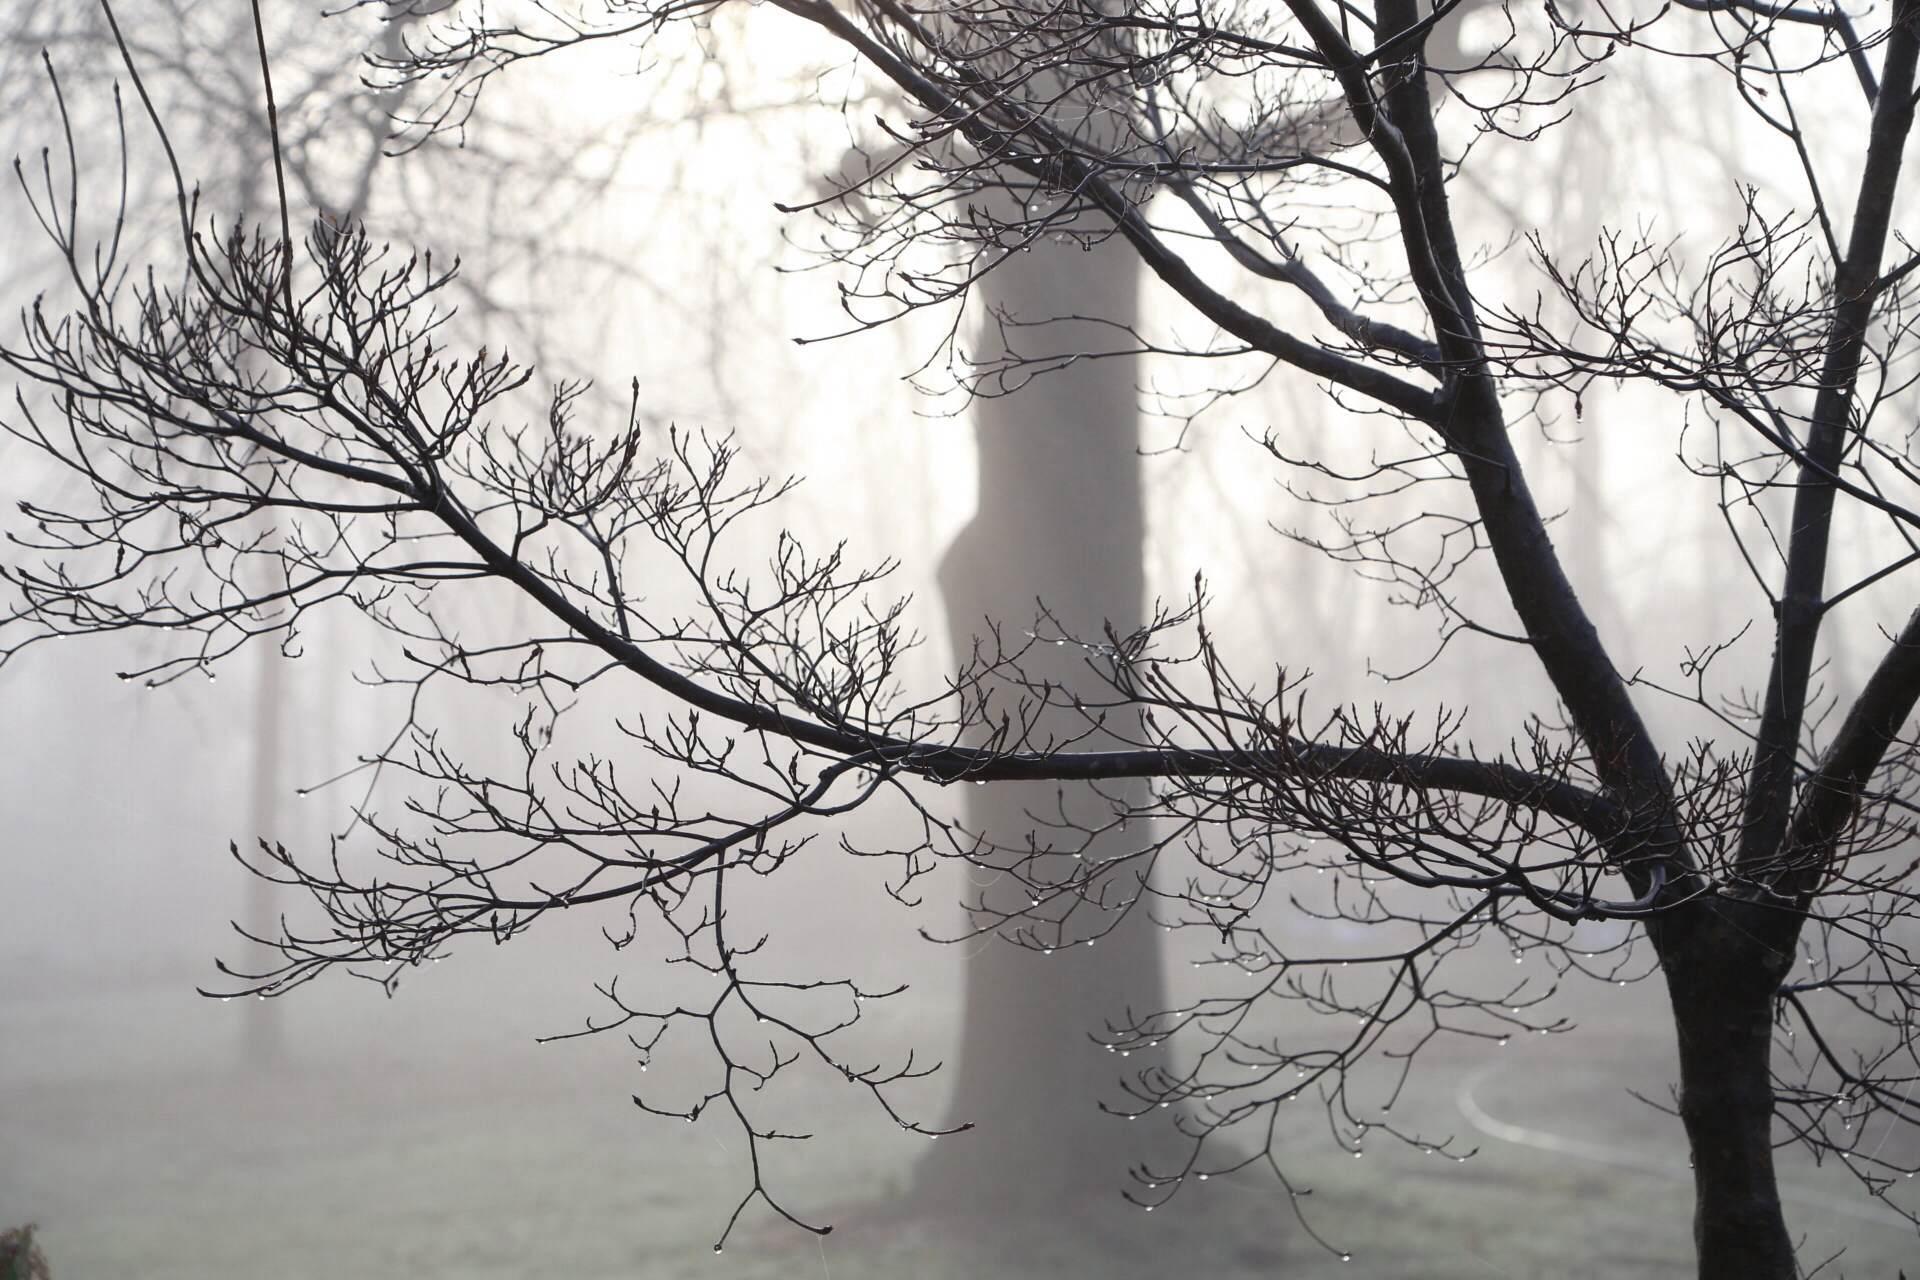 Morning fog ahead of a warm spring day